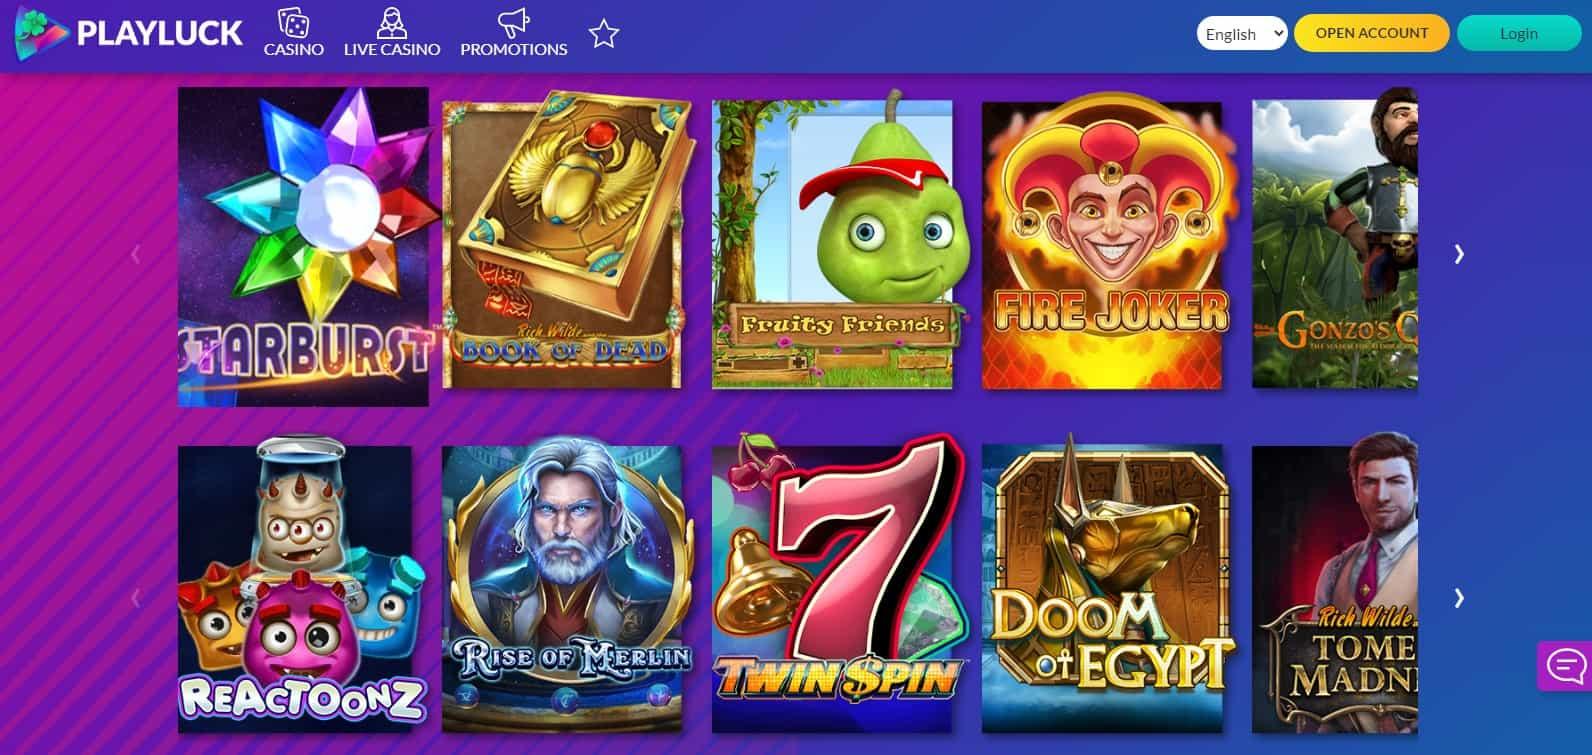 Playluck Casino Games